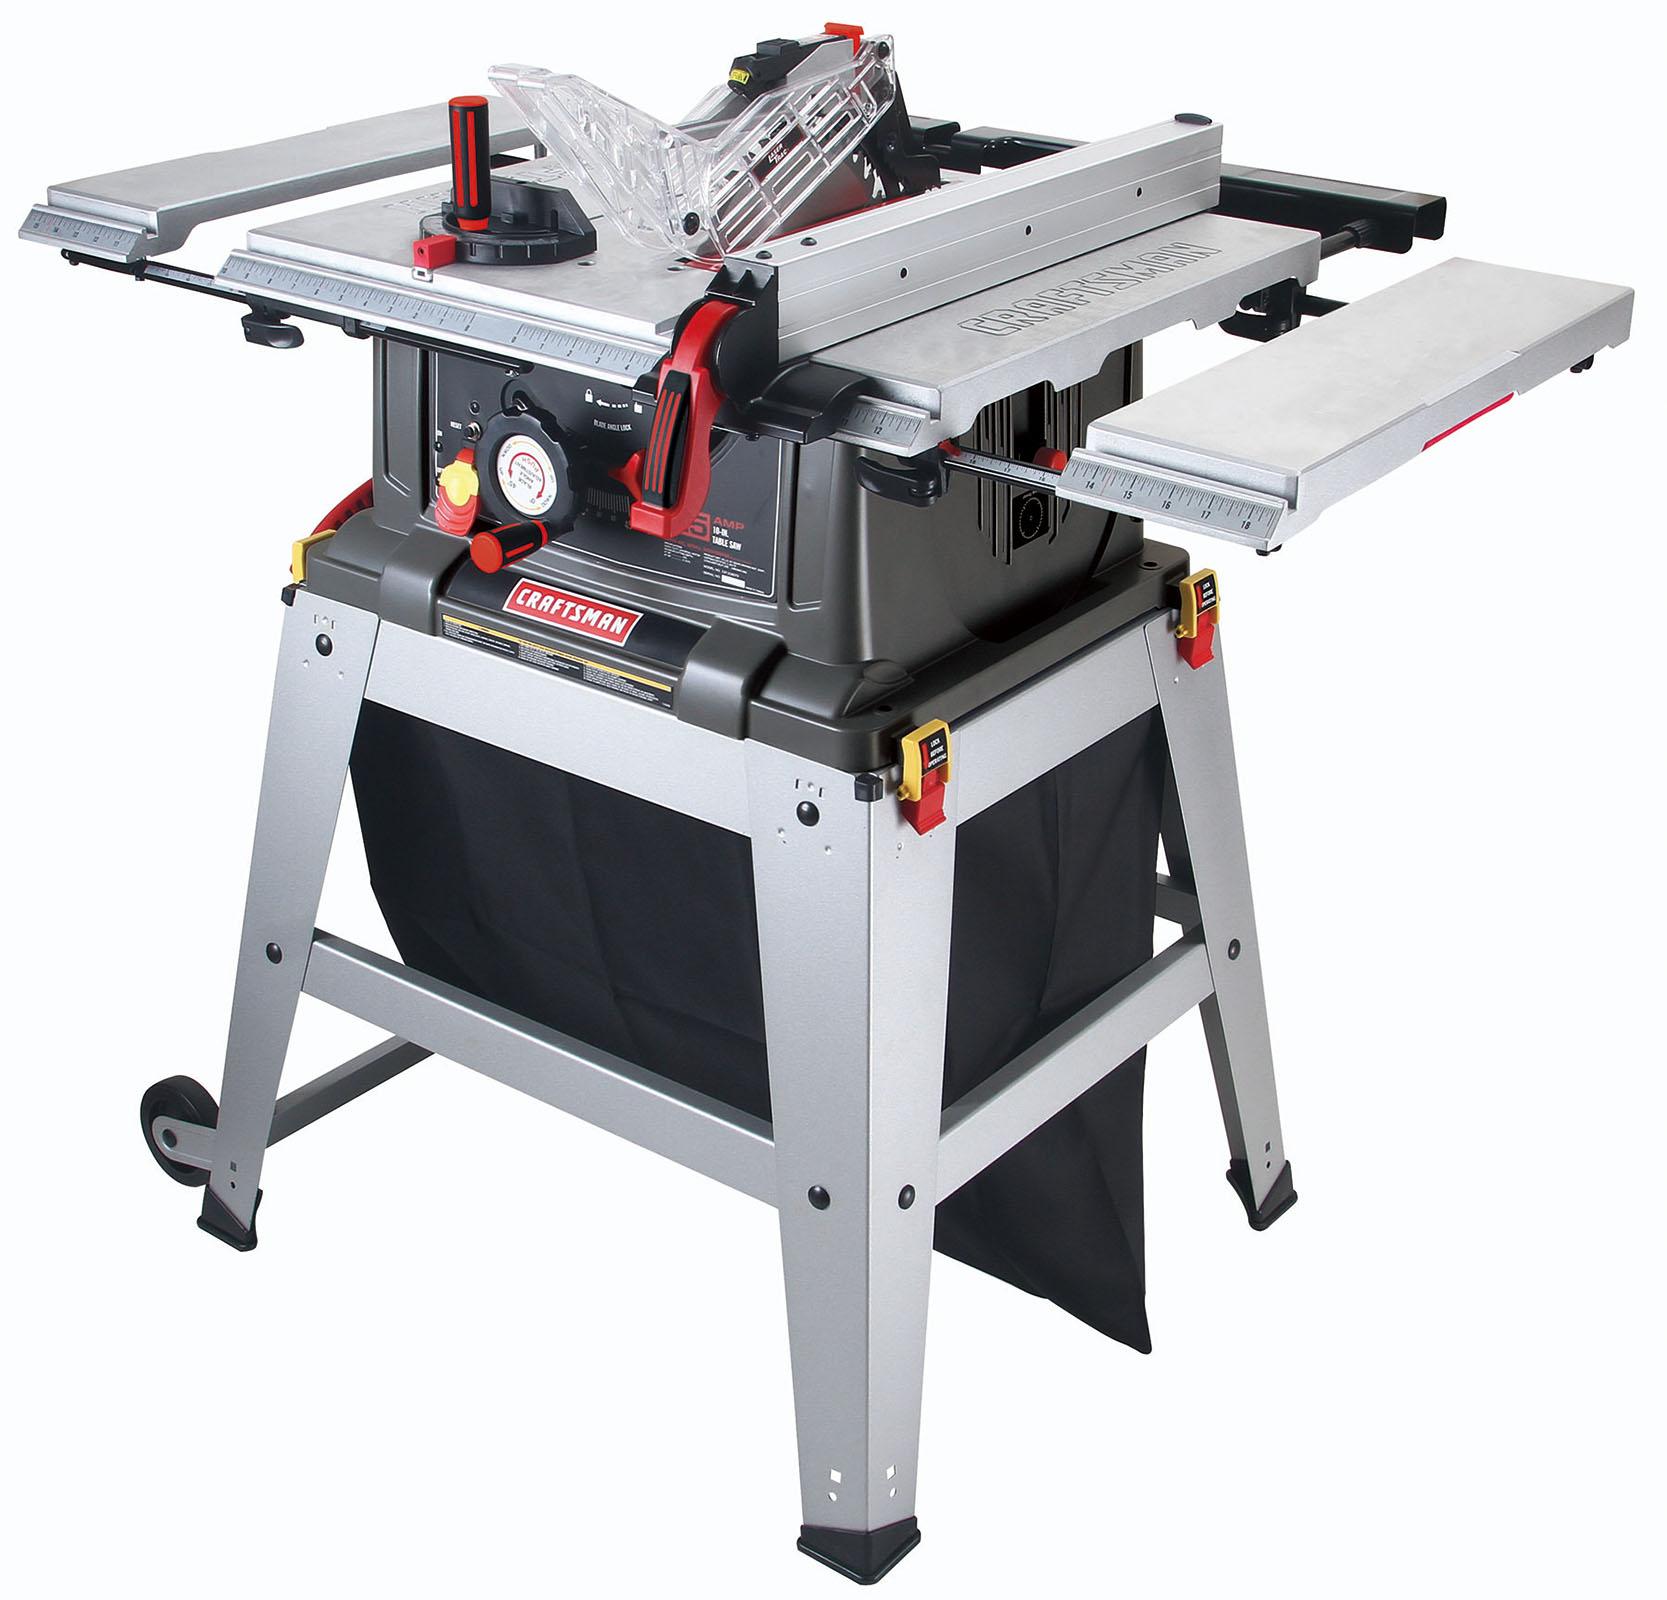 prod 1565359712 wid 200 hei 250 craftsman table saw parts model 137218073 [ 1667 x 1600 Pixel ]